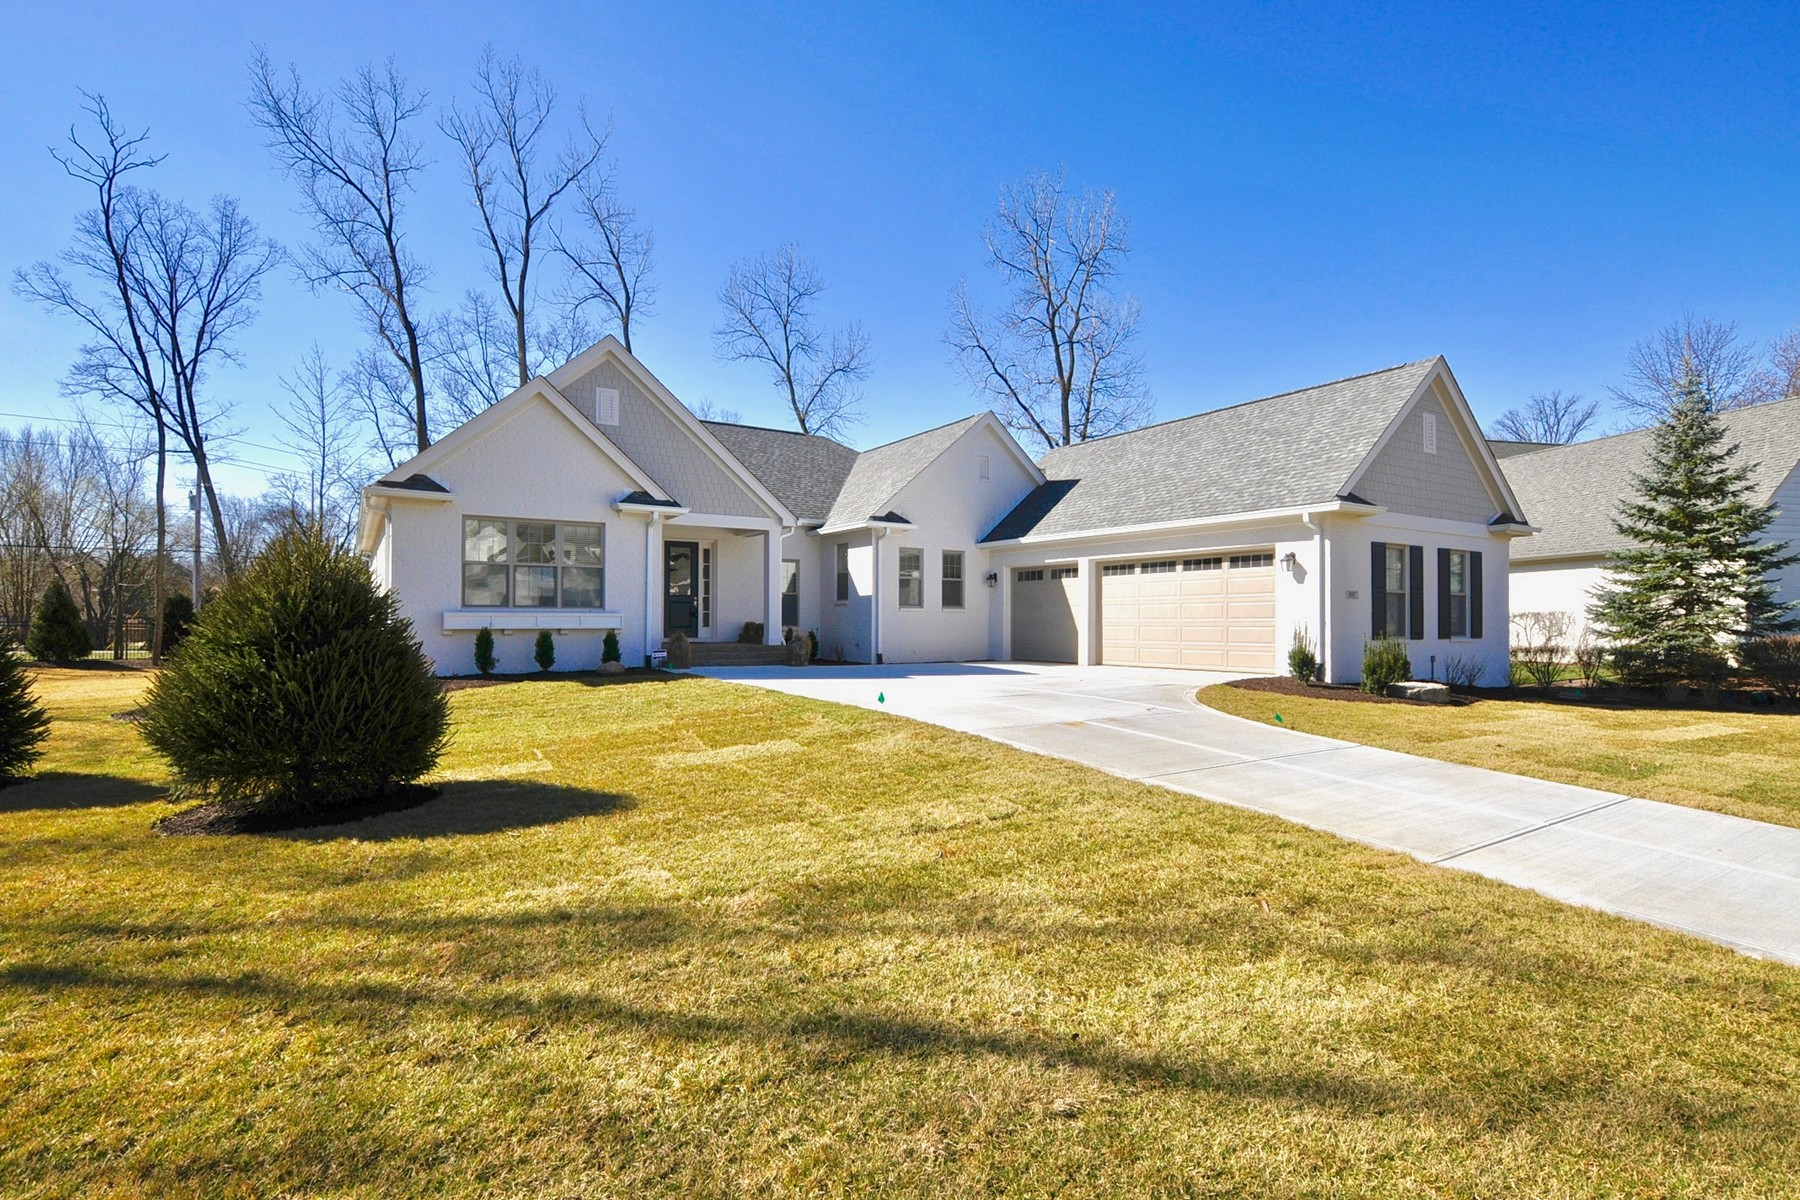 Casa para uma família para Venda às Luxury and Top of the Line Features 207 Willowrun Place Indianapolis, Indiana, 46260 Estados Unidos